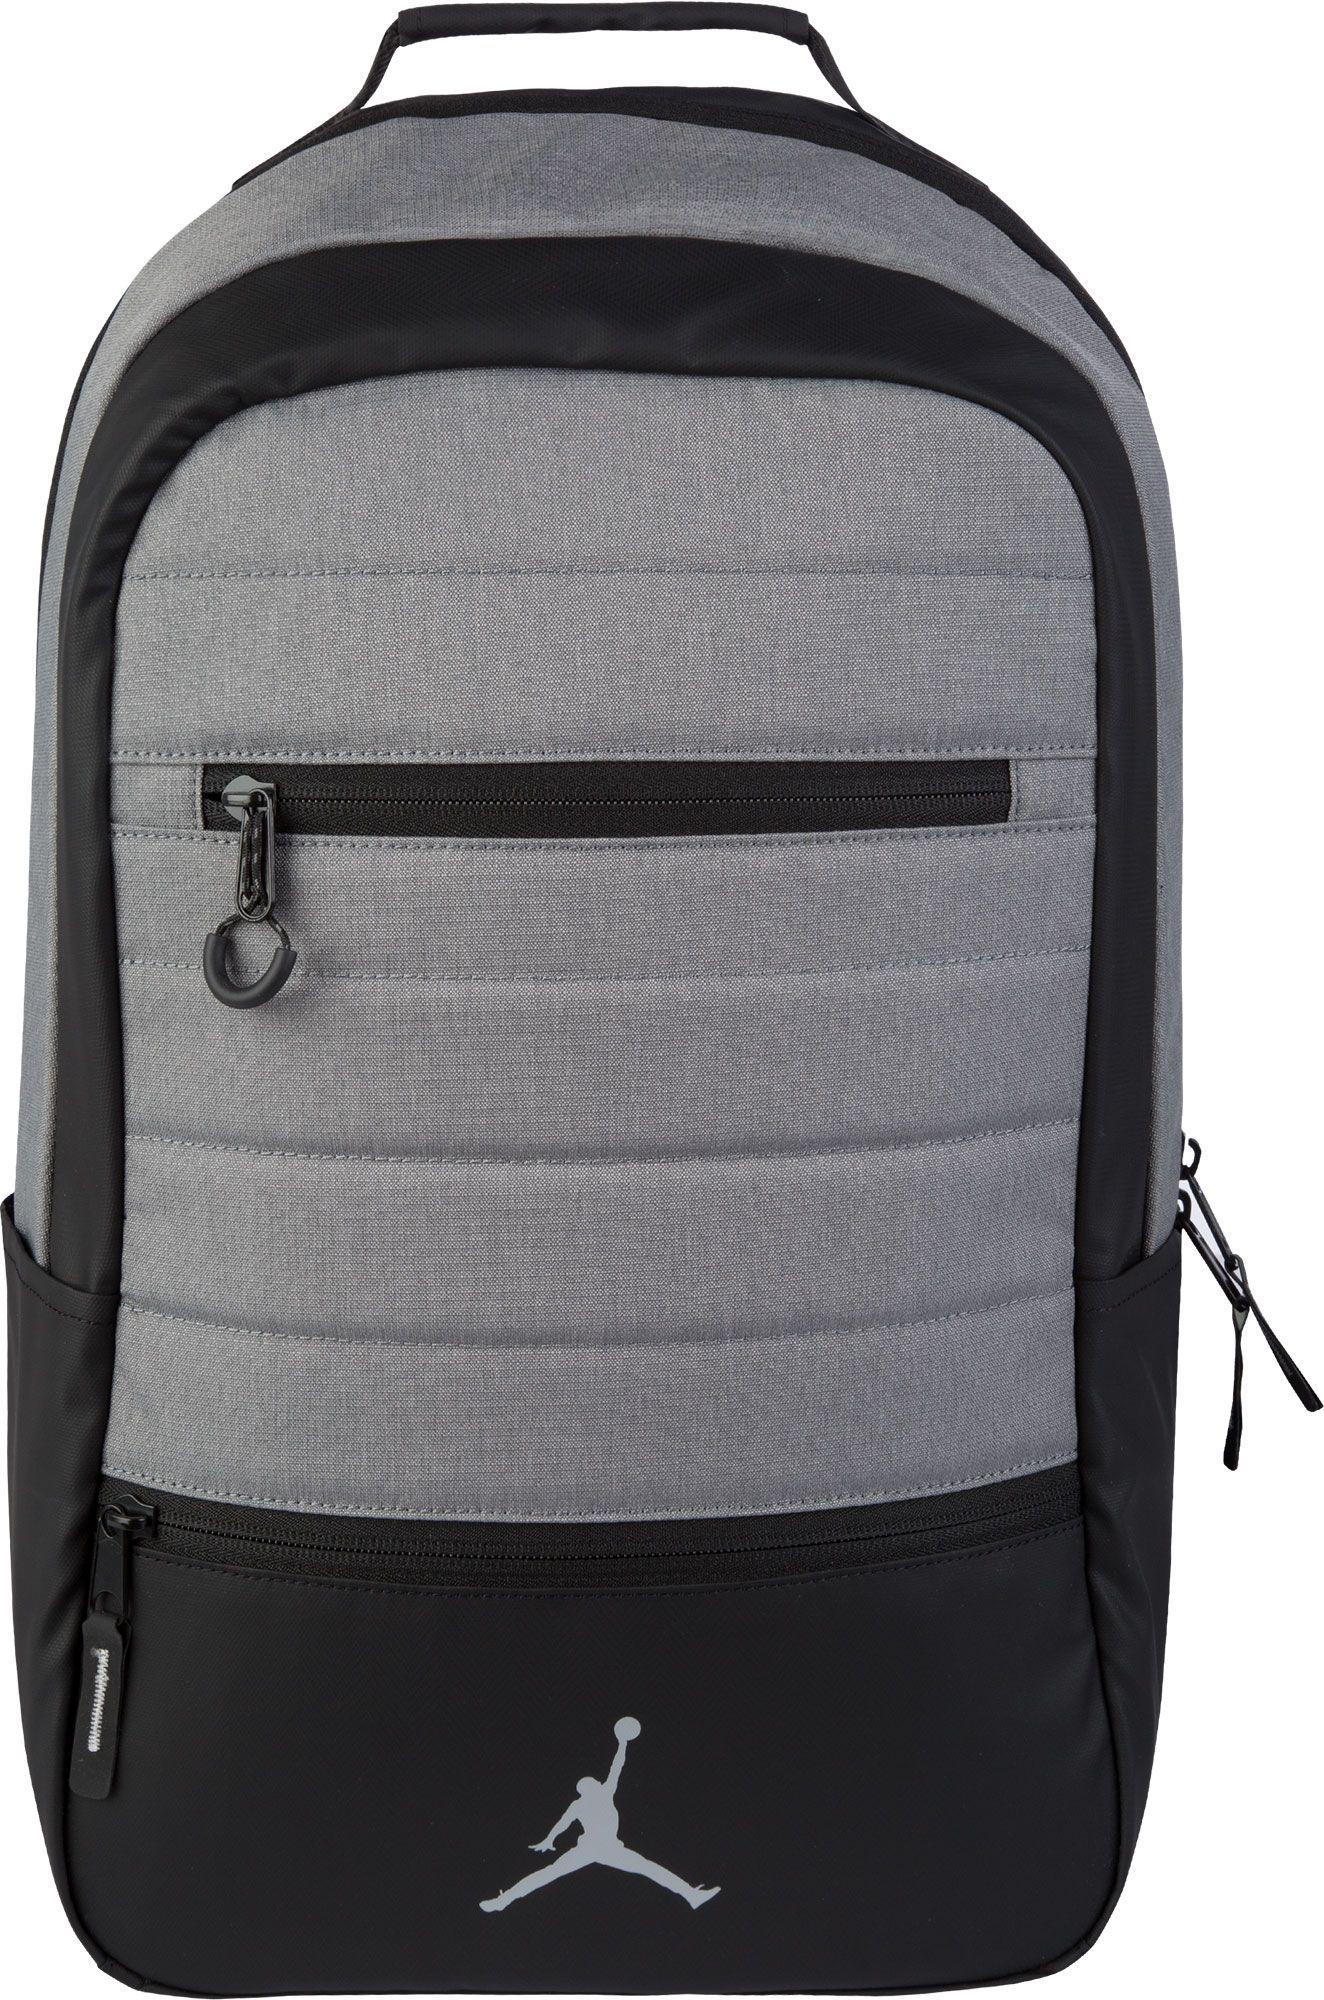 Jordan Airborne Backpack in 2019